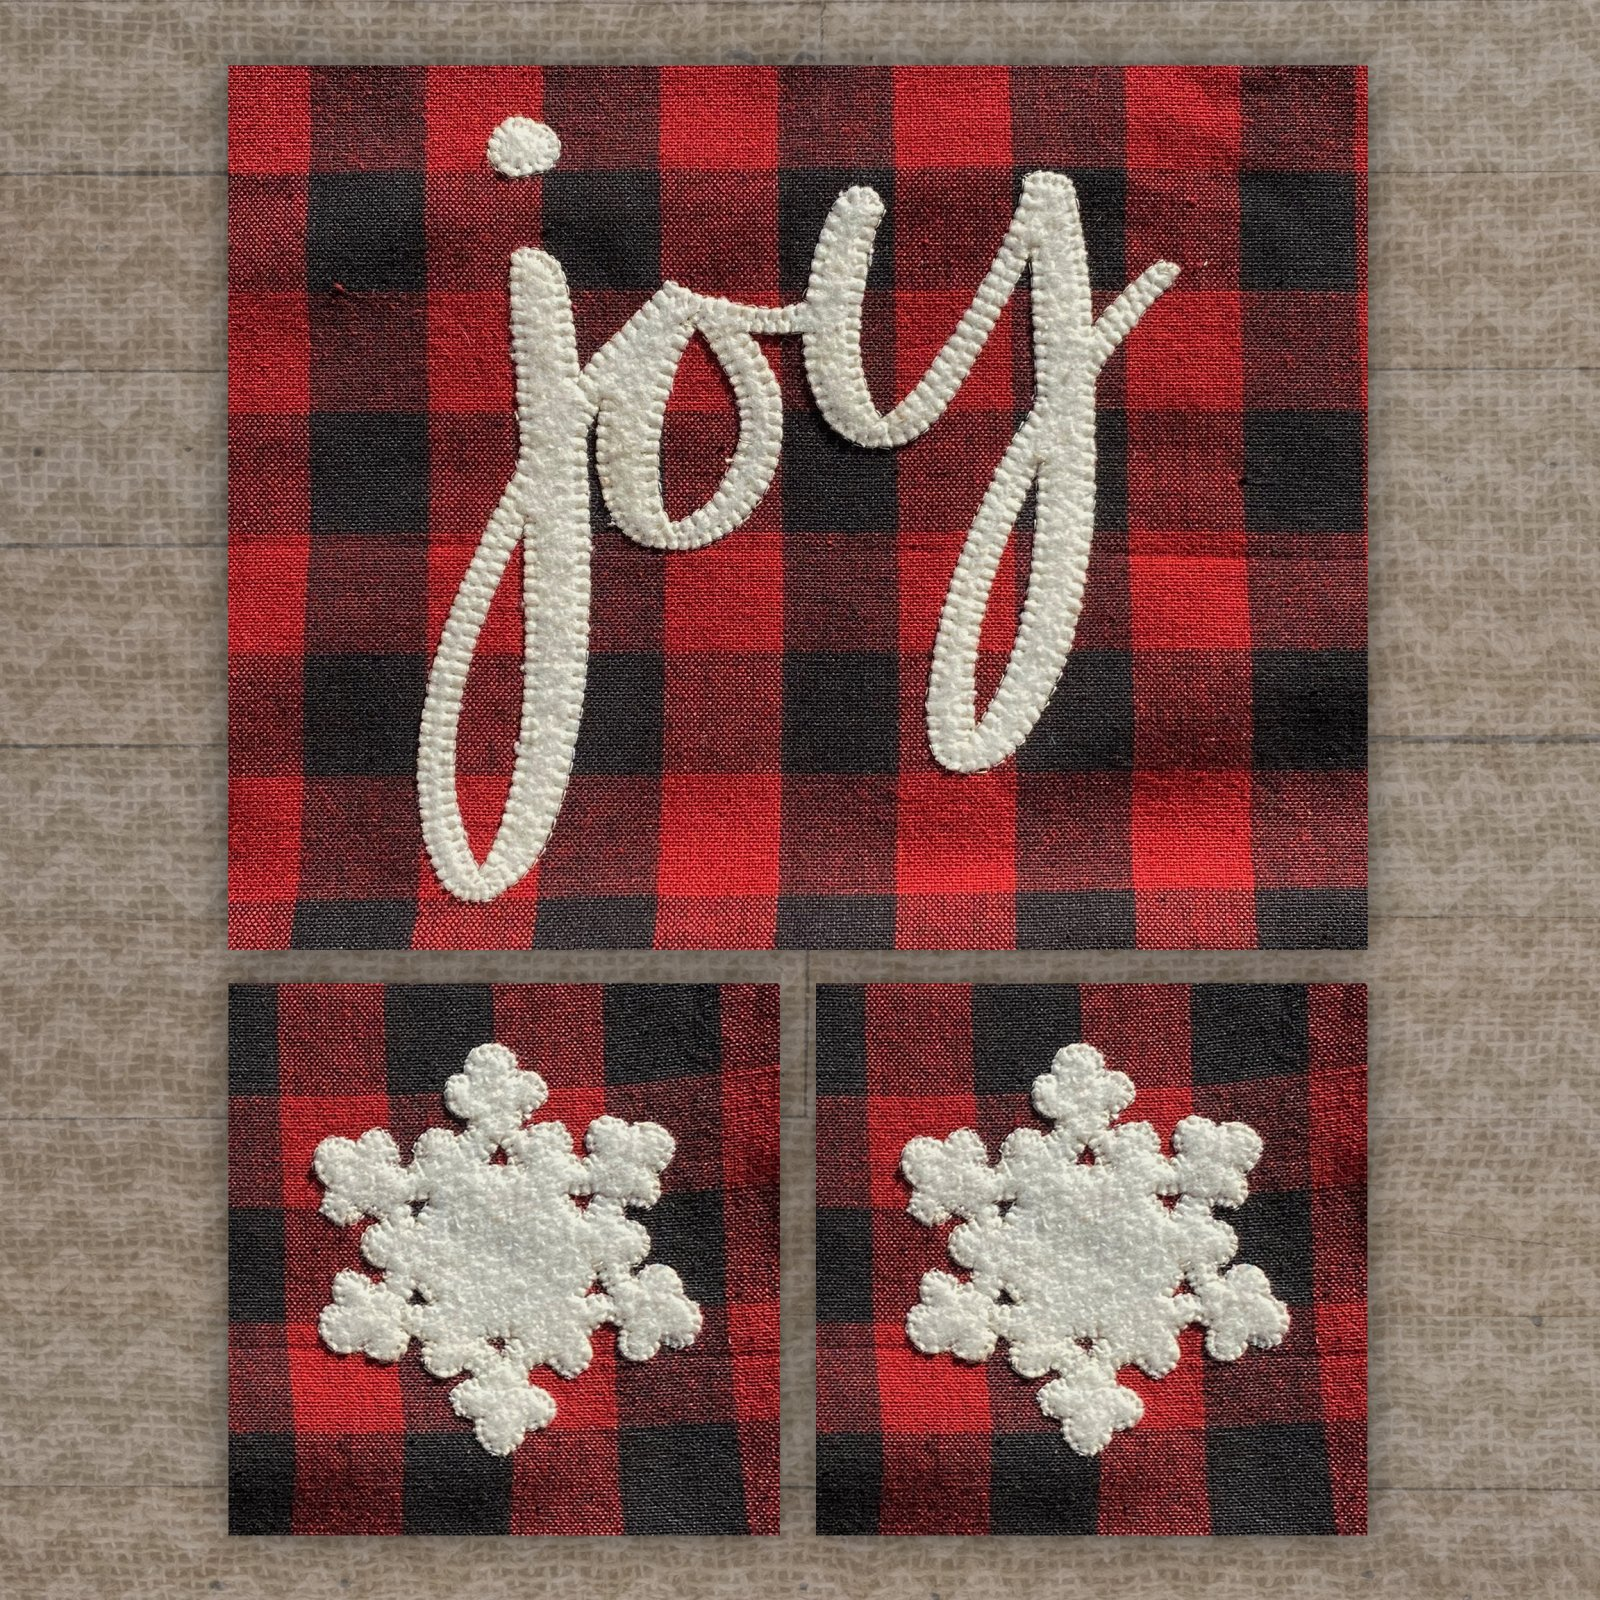 Joy & Snowflakes Precut Fused Applique Pack